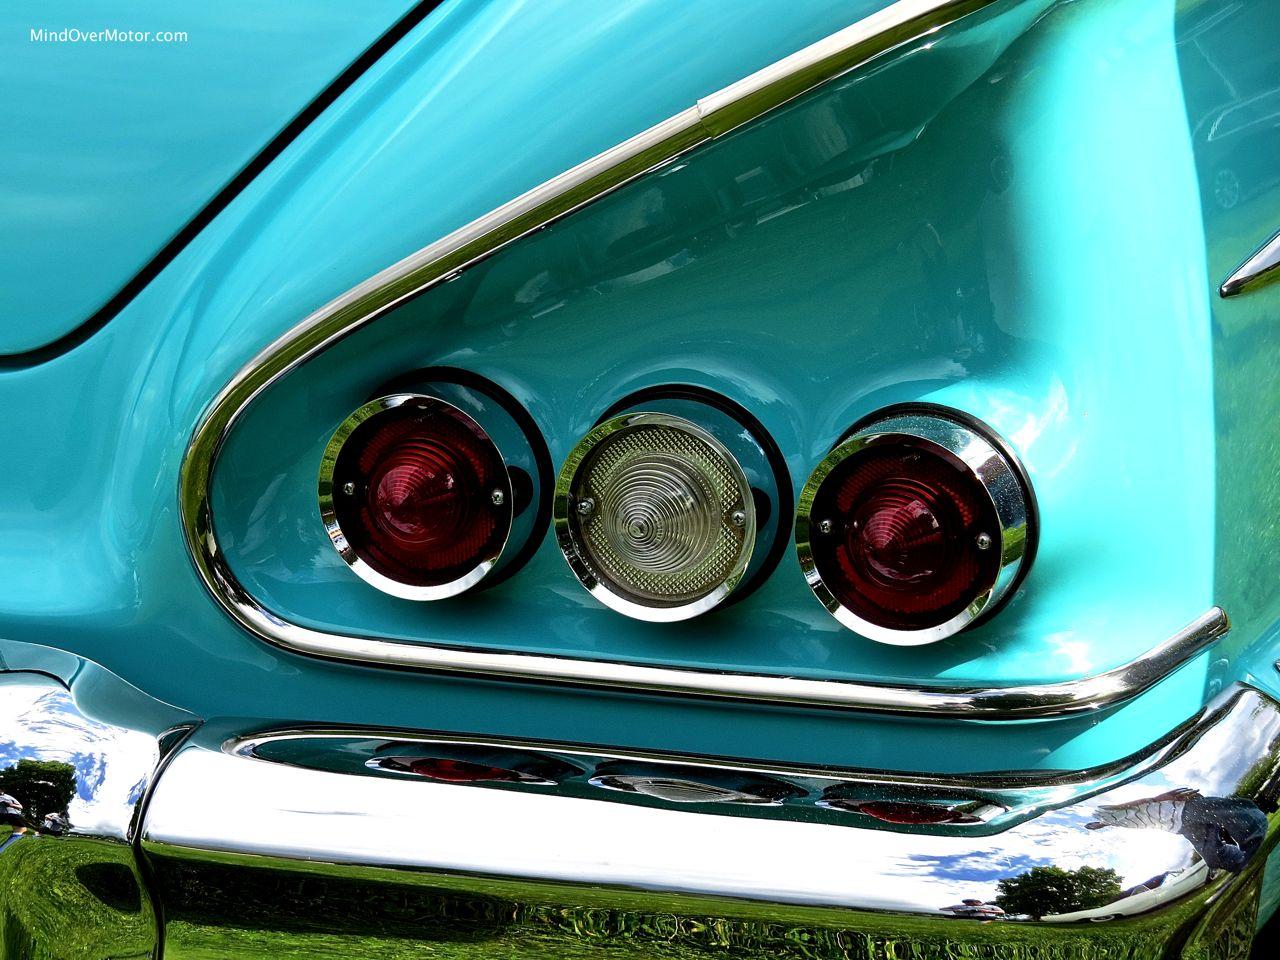 1958 Chevrolet Impala Taillights